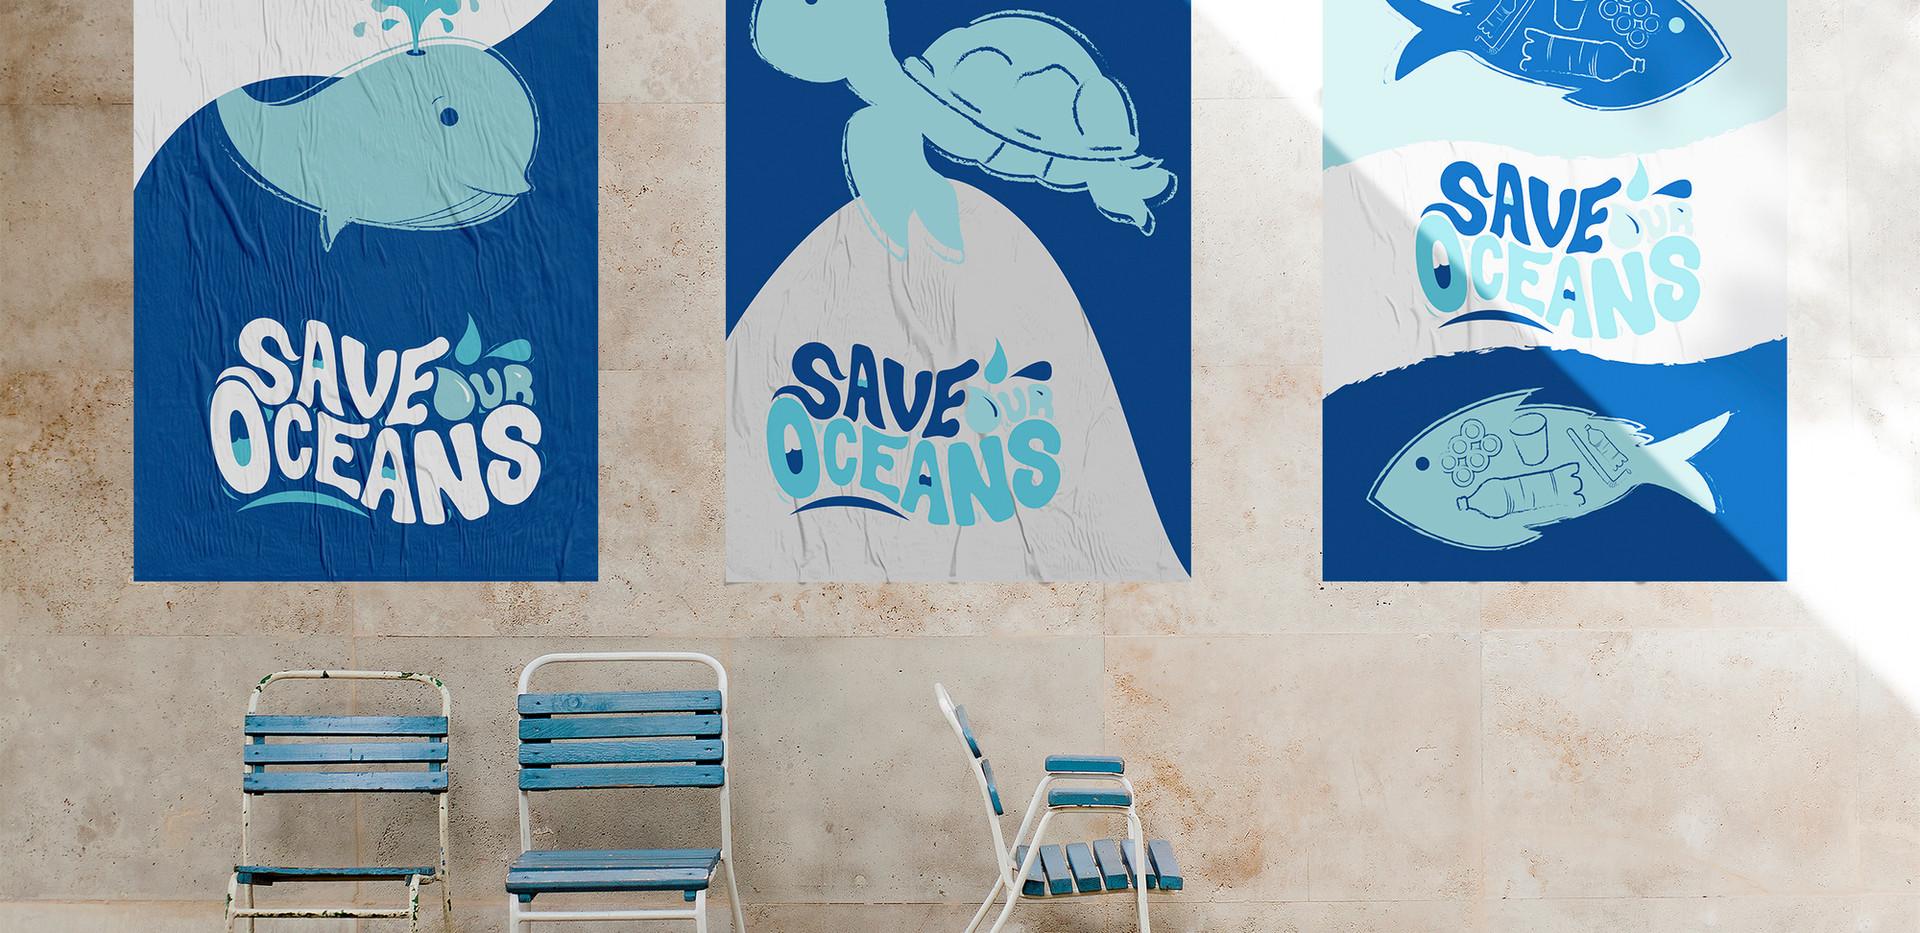 save our oceans3.jpg